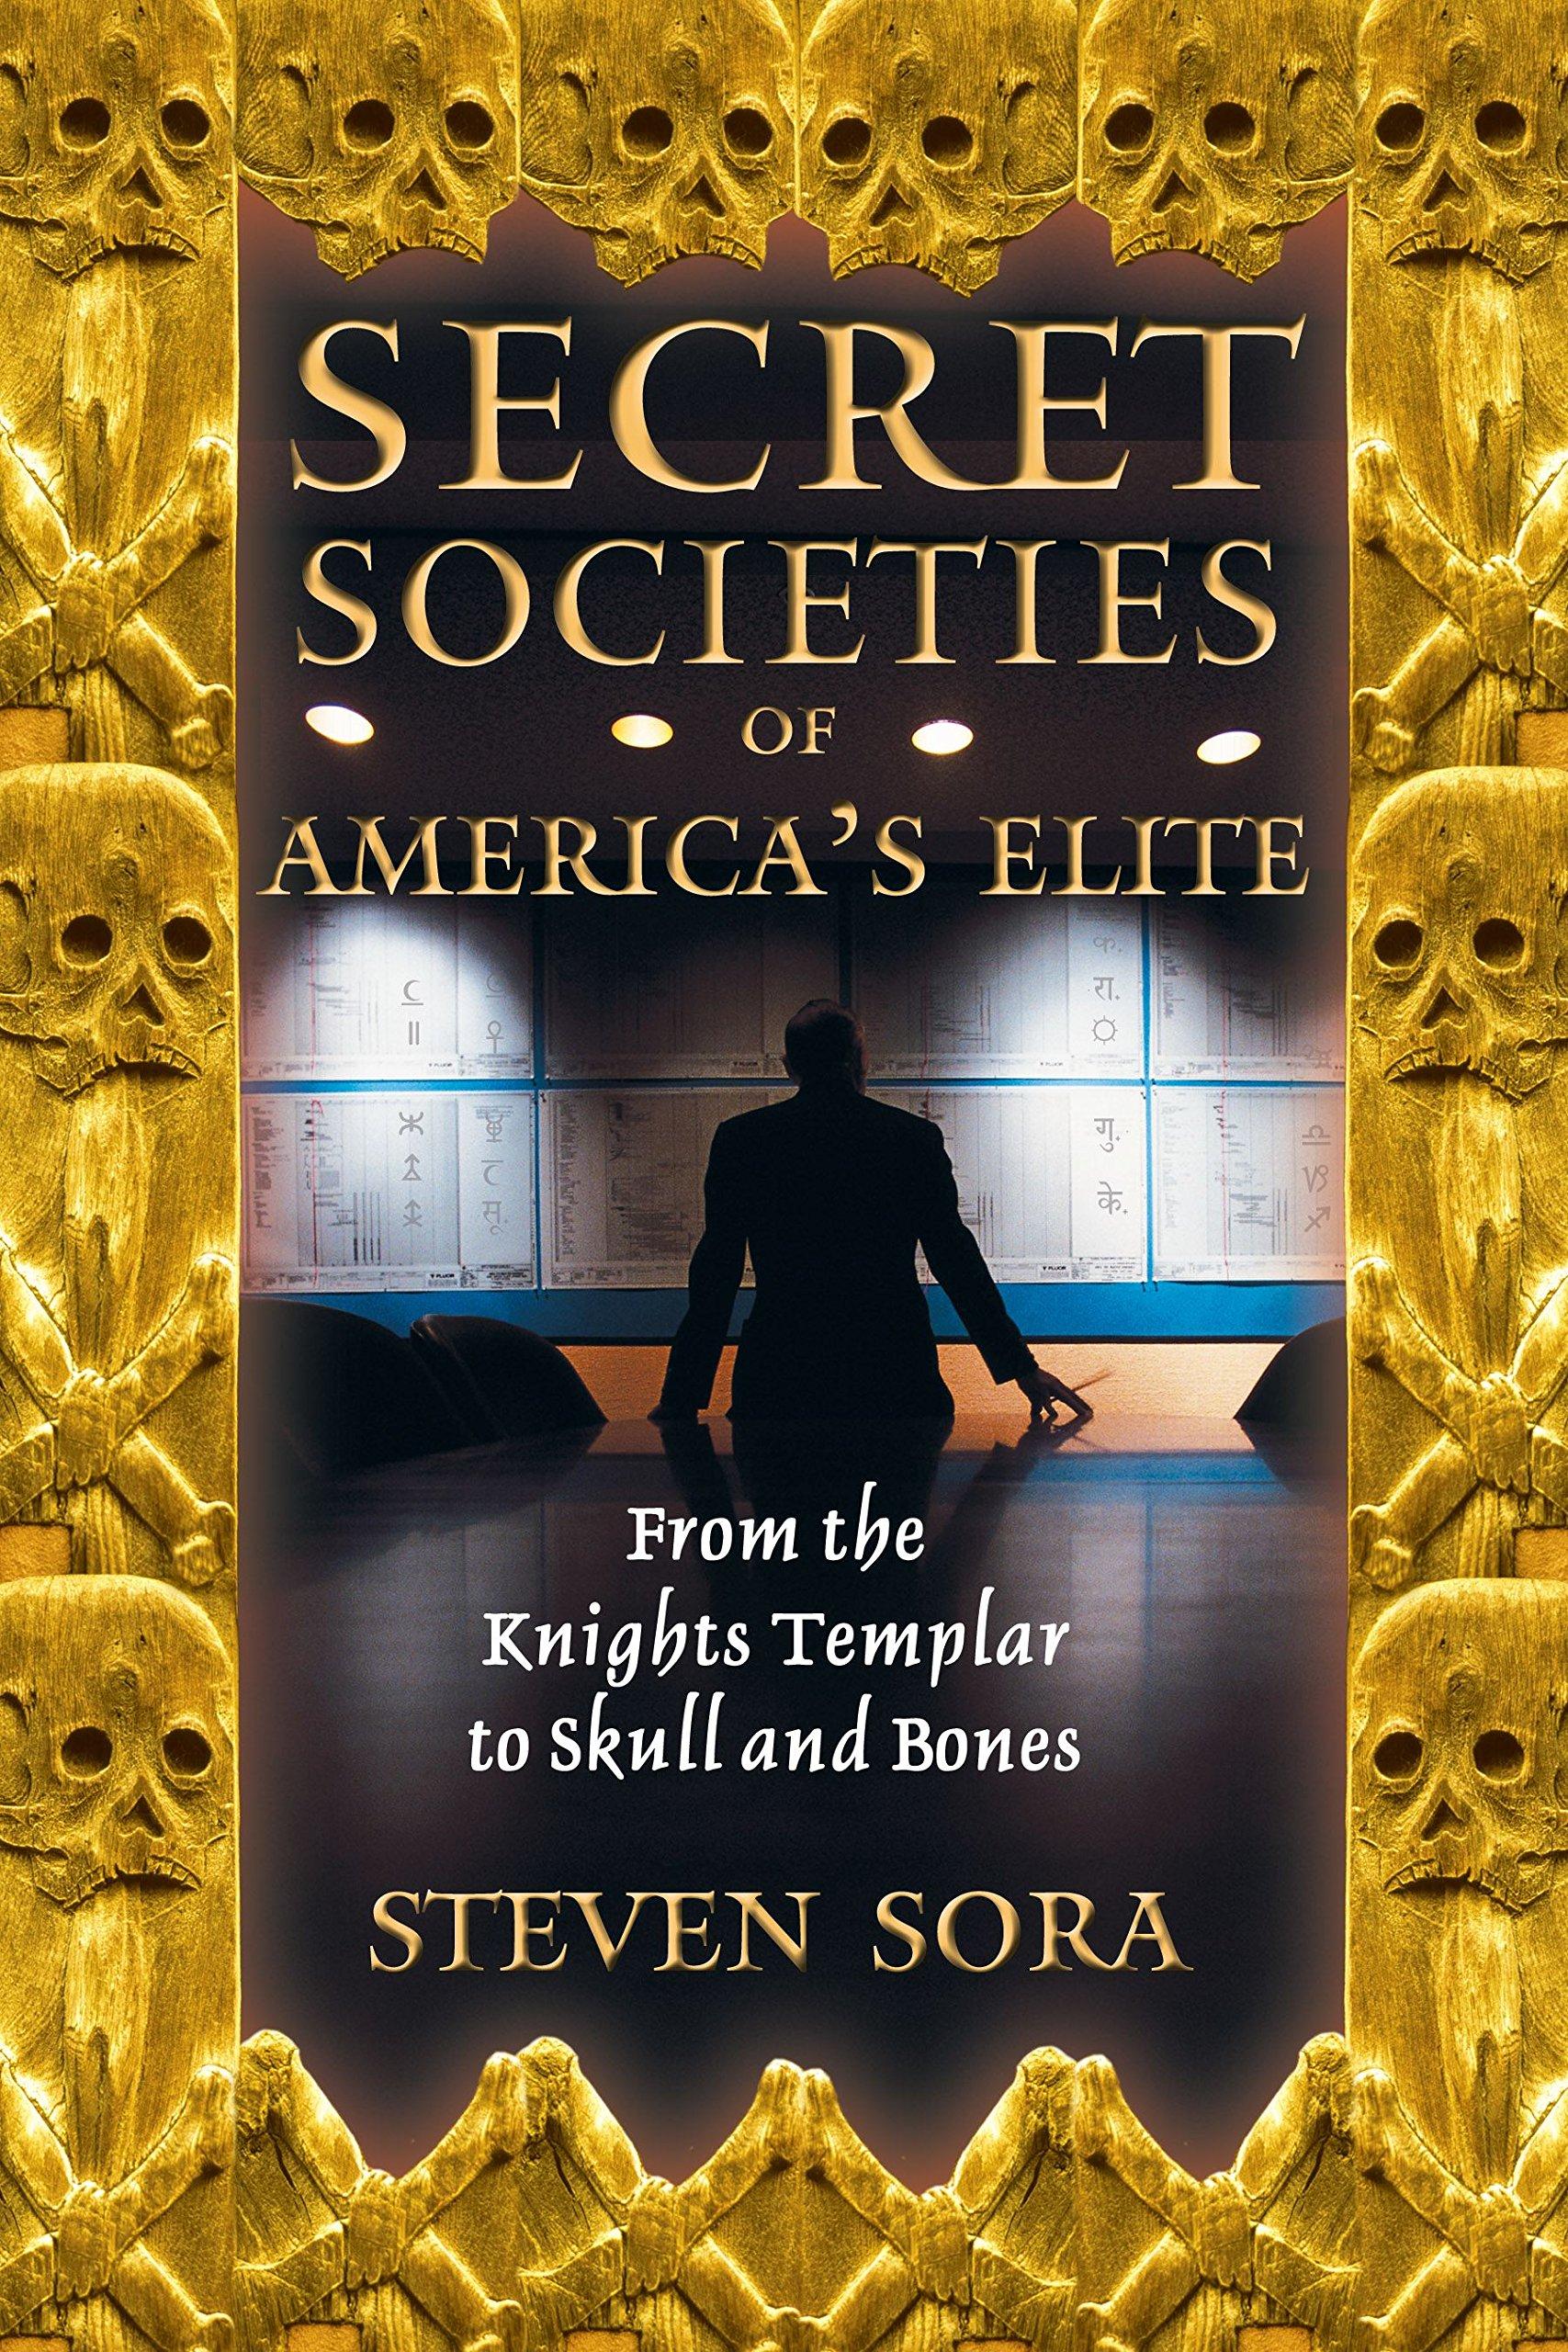 Secret Societies of America's Elite: From the Knights Templar to Skull and Bones